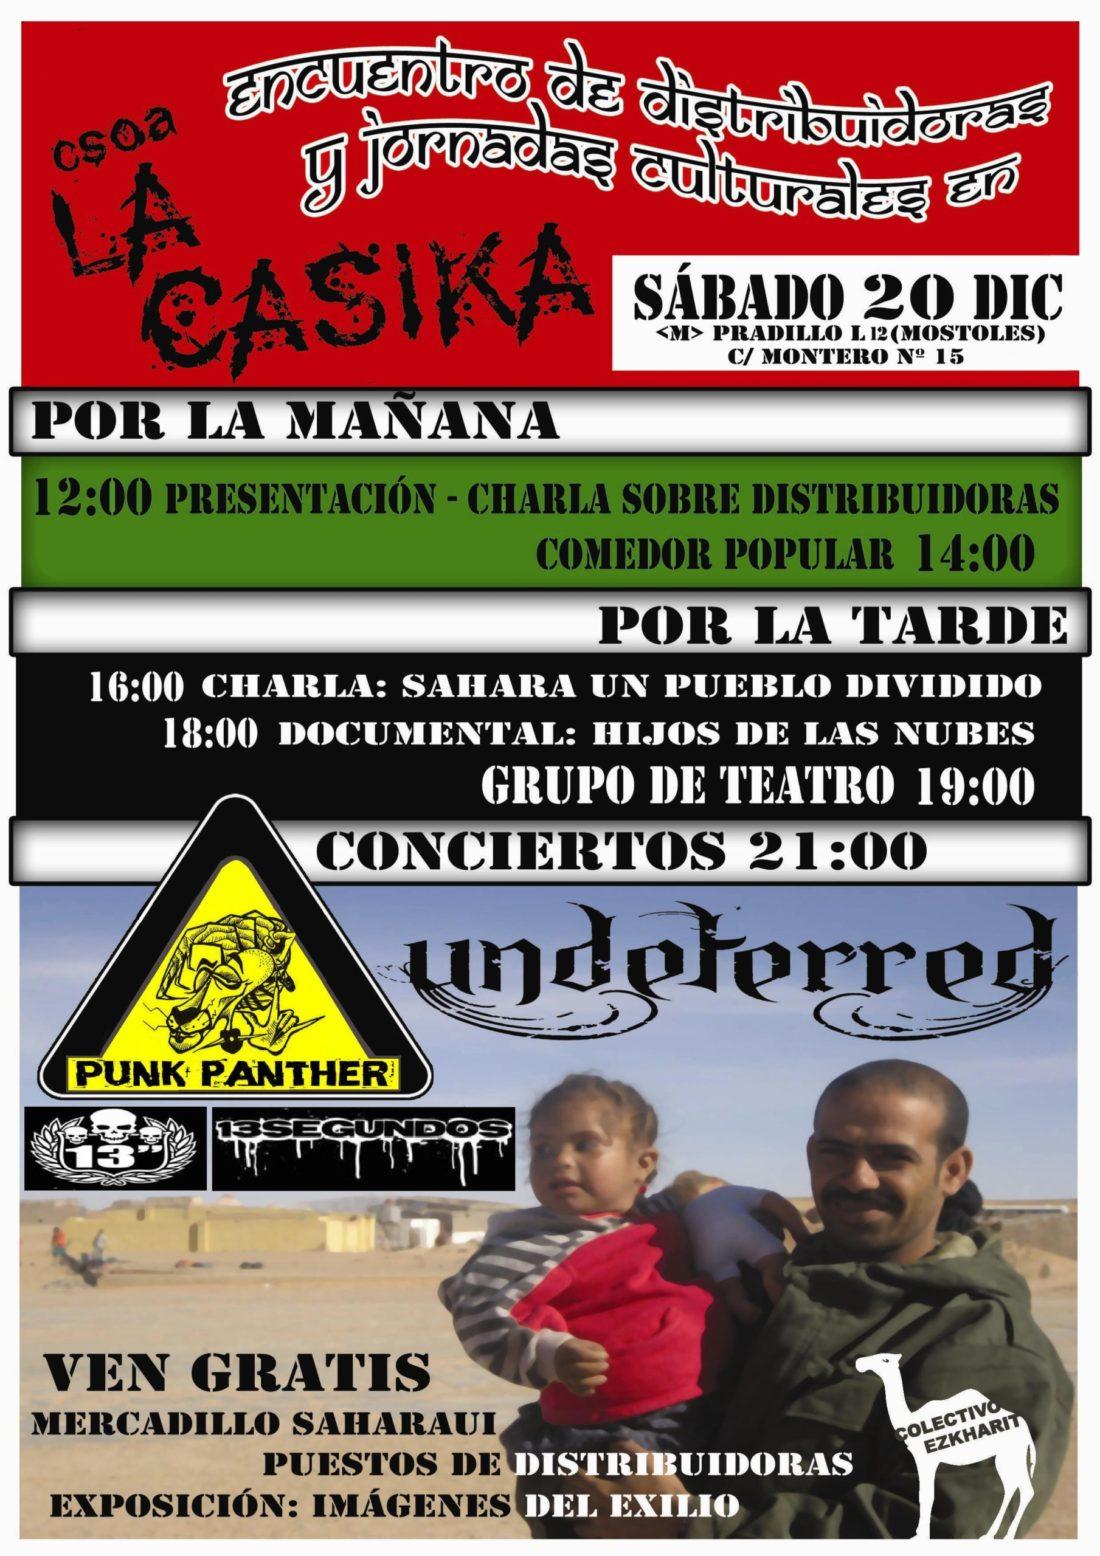 Móstoles, CSOA La Casika, sábado 20: Jornadas Saharauis + Concierto Punk Panther